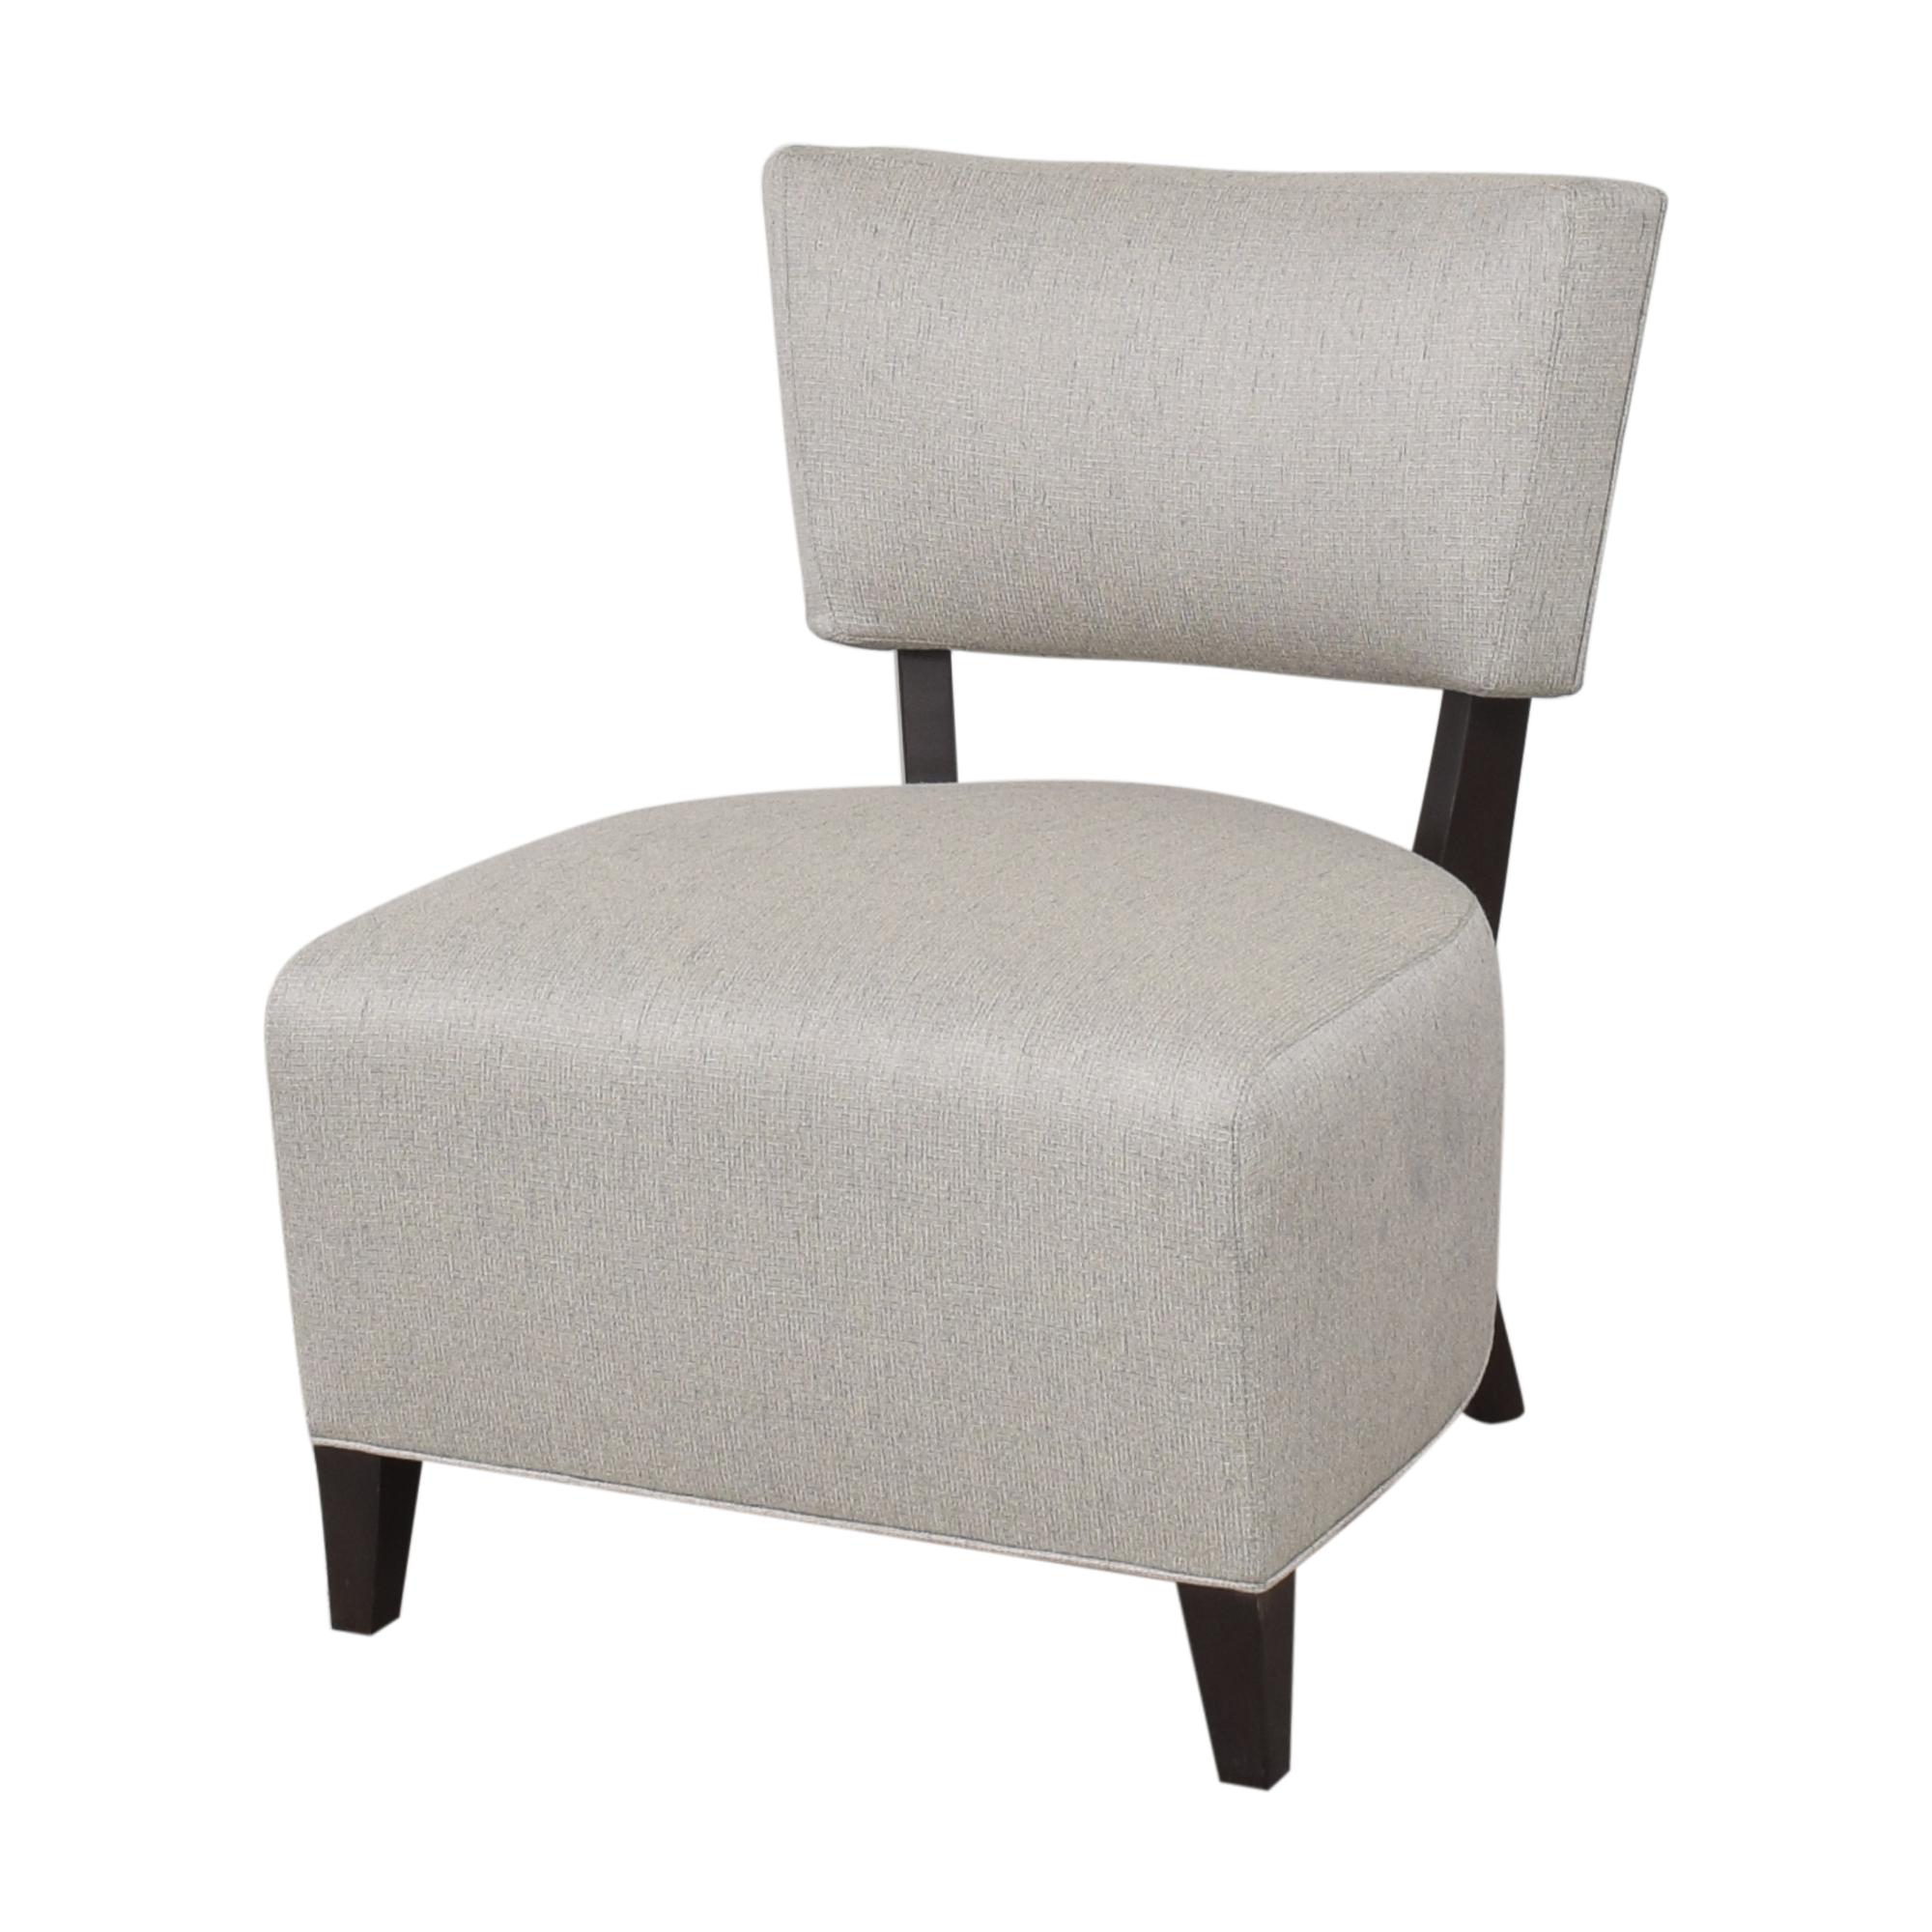 Ethan Allen Ethan Allen Armless Accent Chair nyc